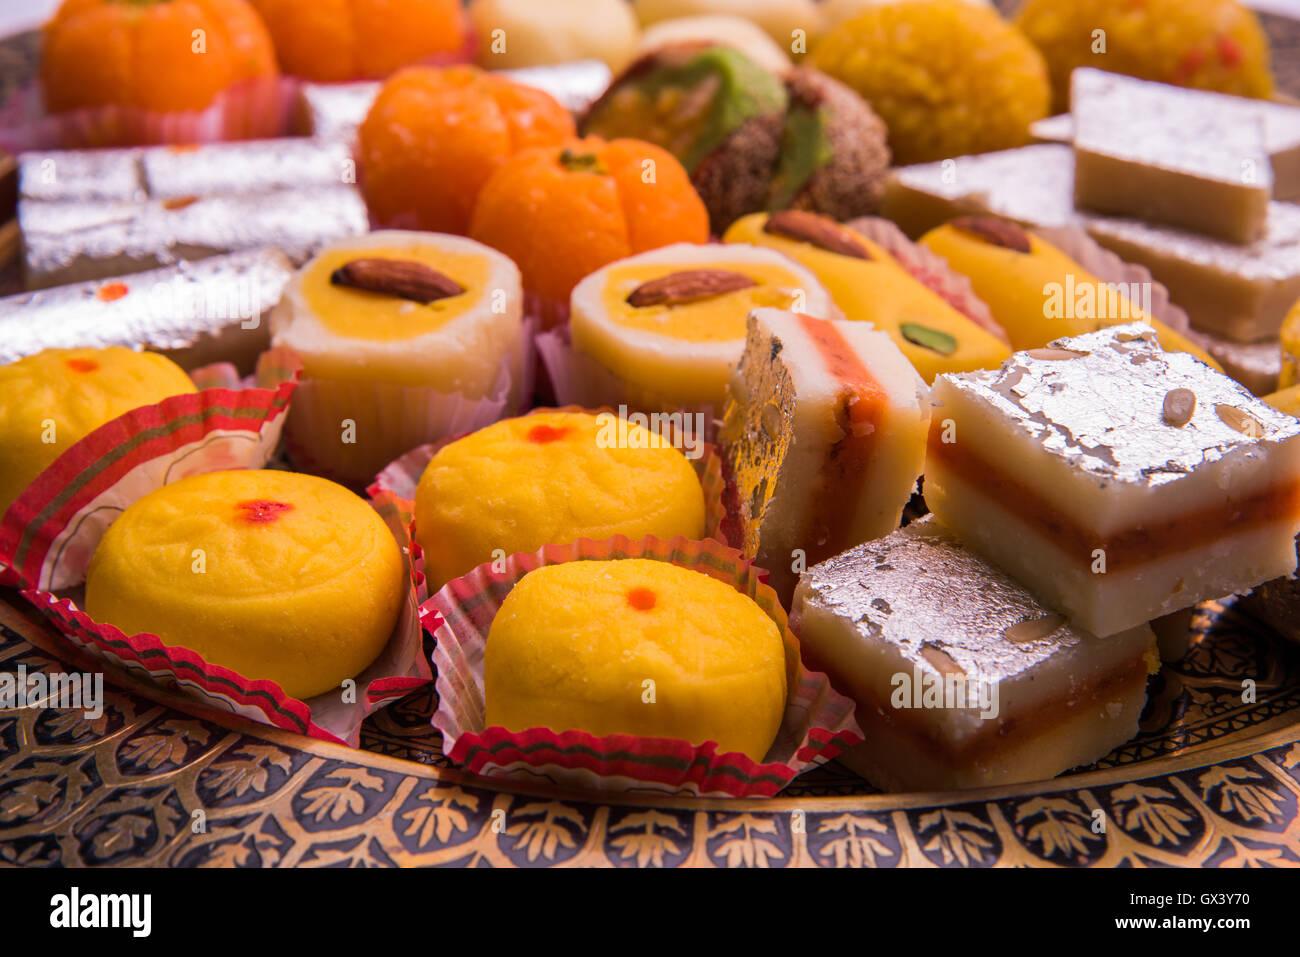 Indian Sweet Food Consumed In Festivals Like Diwali, Holi